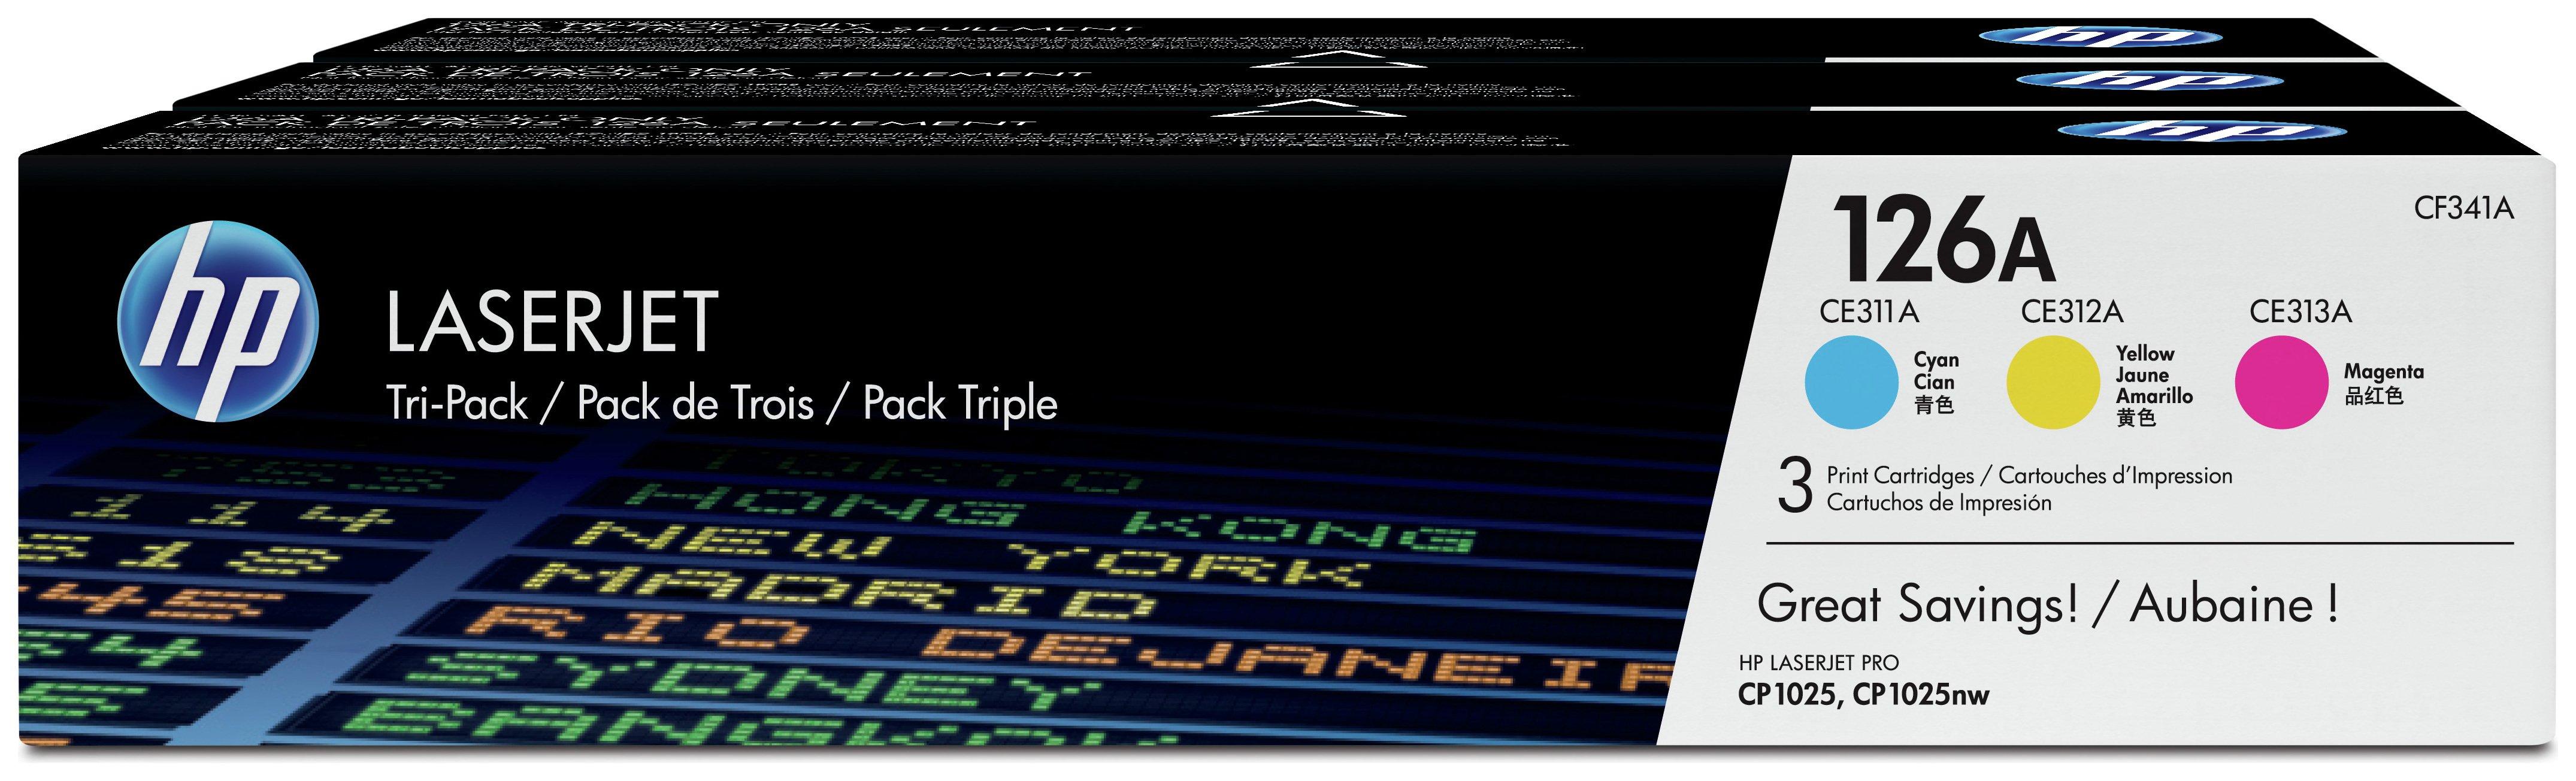 HP - 126A 3-pack Cyan/Magenta/Yellow LaserJet - Toner (CF341A)